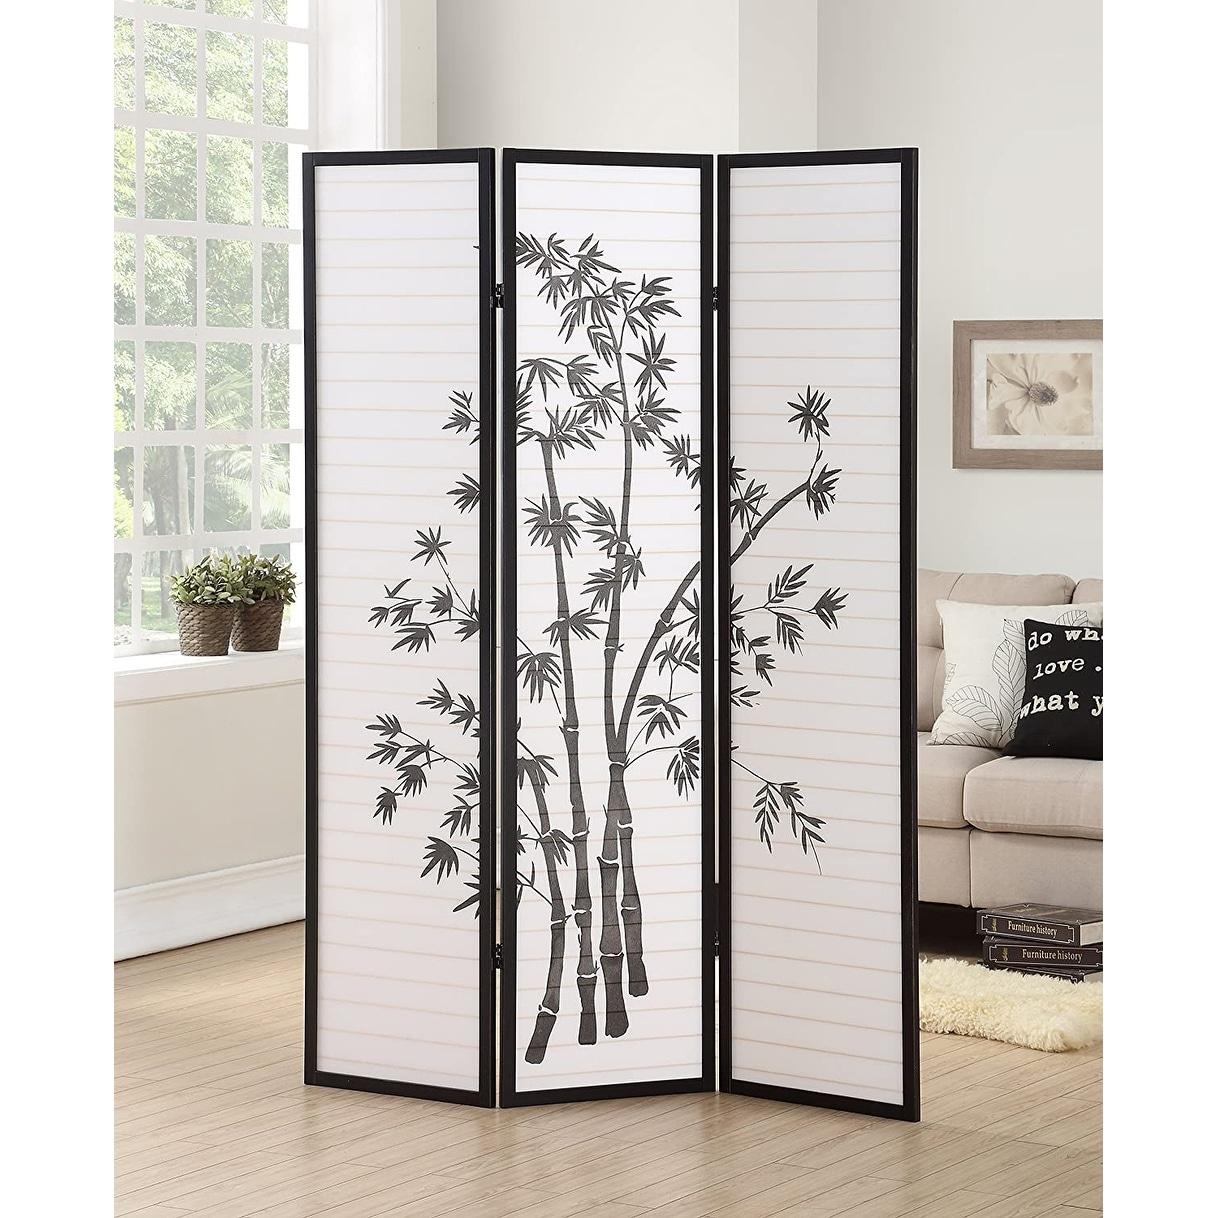 IN NATURE COLOR ASDI Brand New 3-panel ASIAN STYLE SHOJI screen room divider